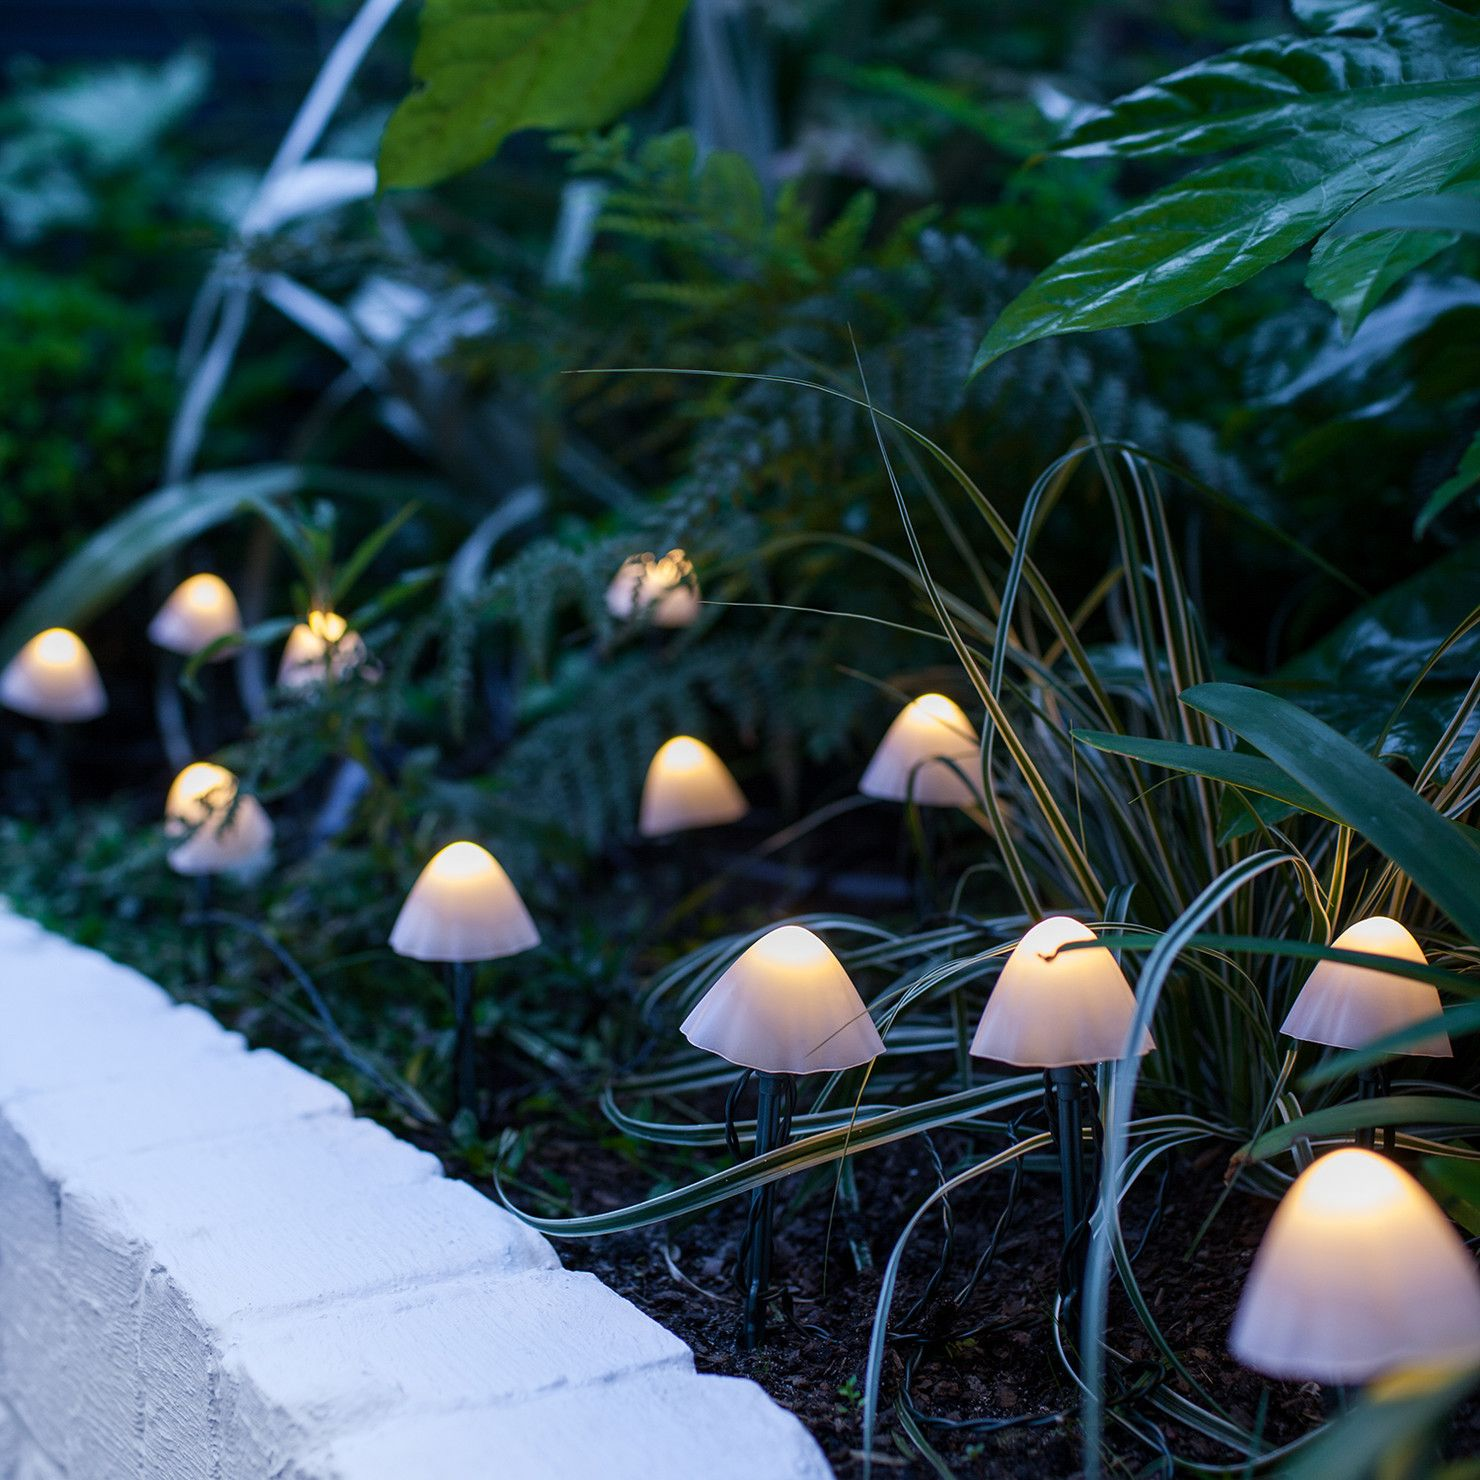 12 Mini Mushroom Solar Stake Lights In 2020 Solar Lights Garden Solar Garden Solar Light Crafts